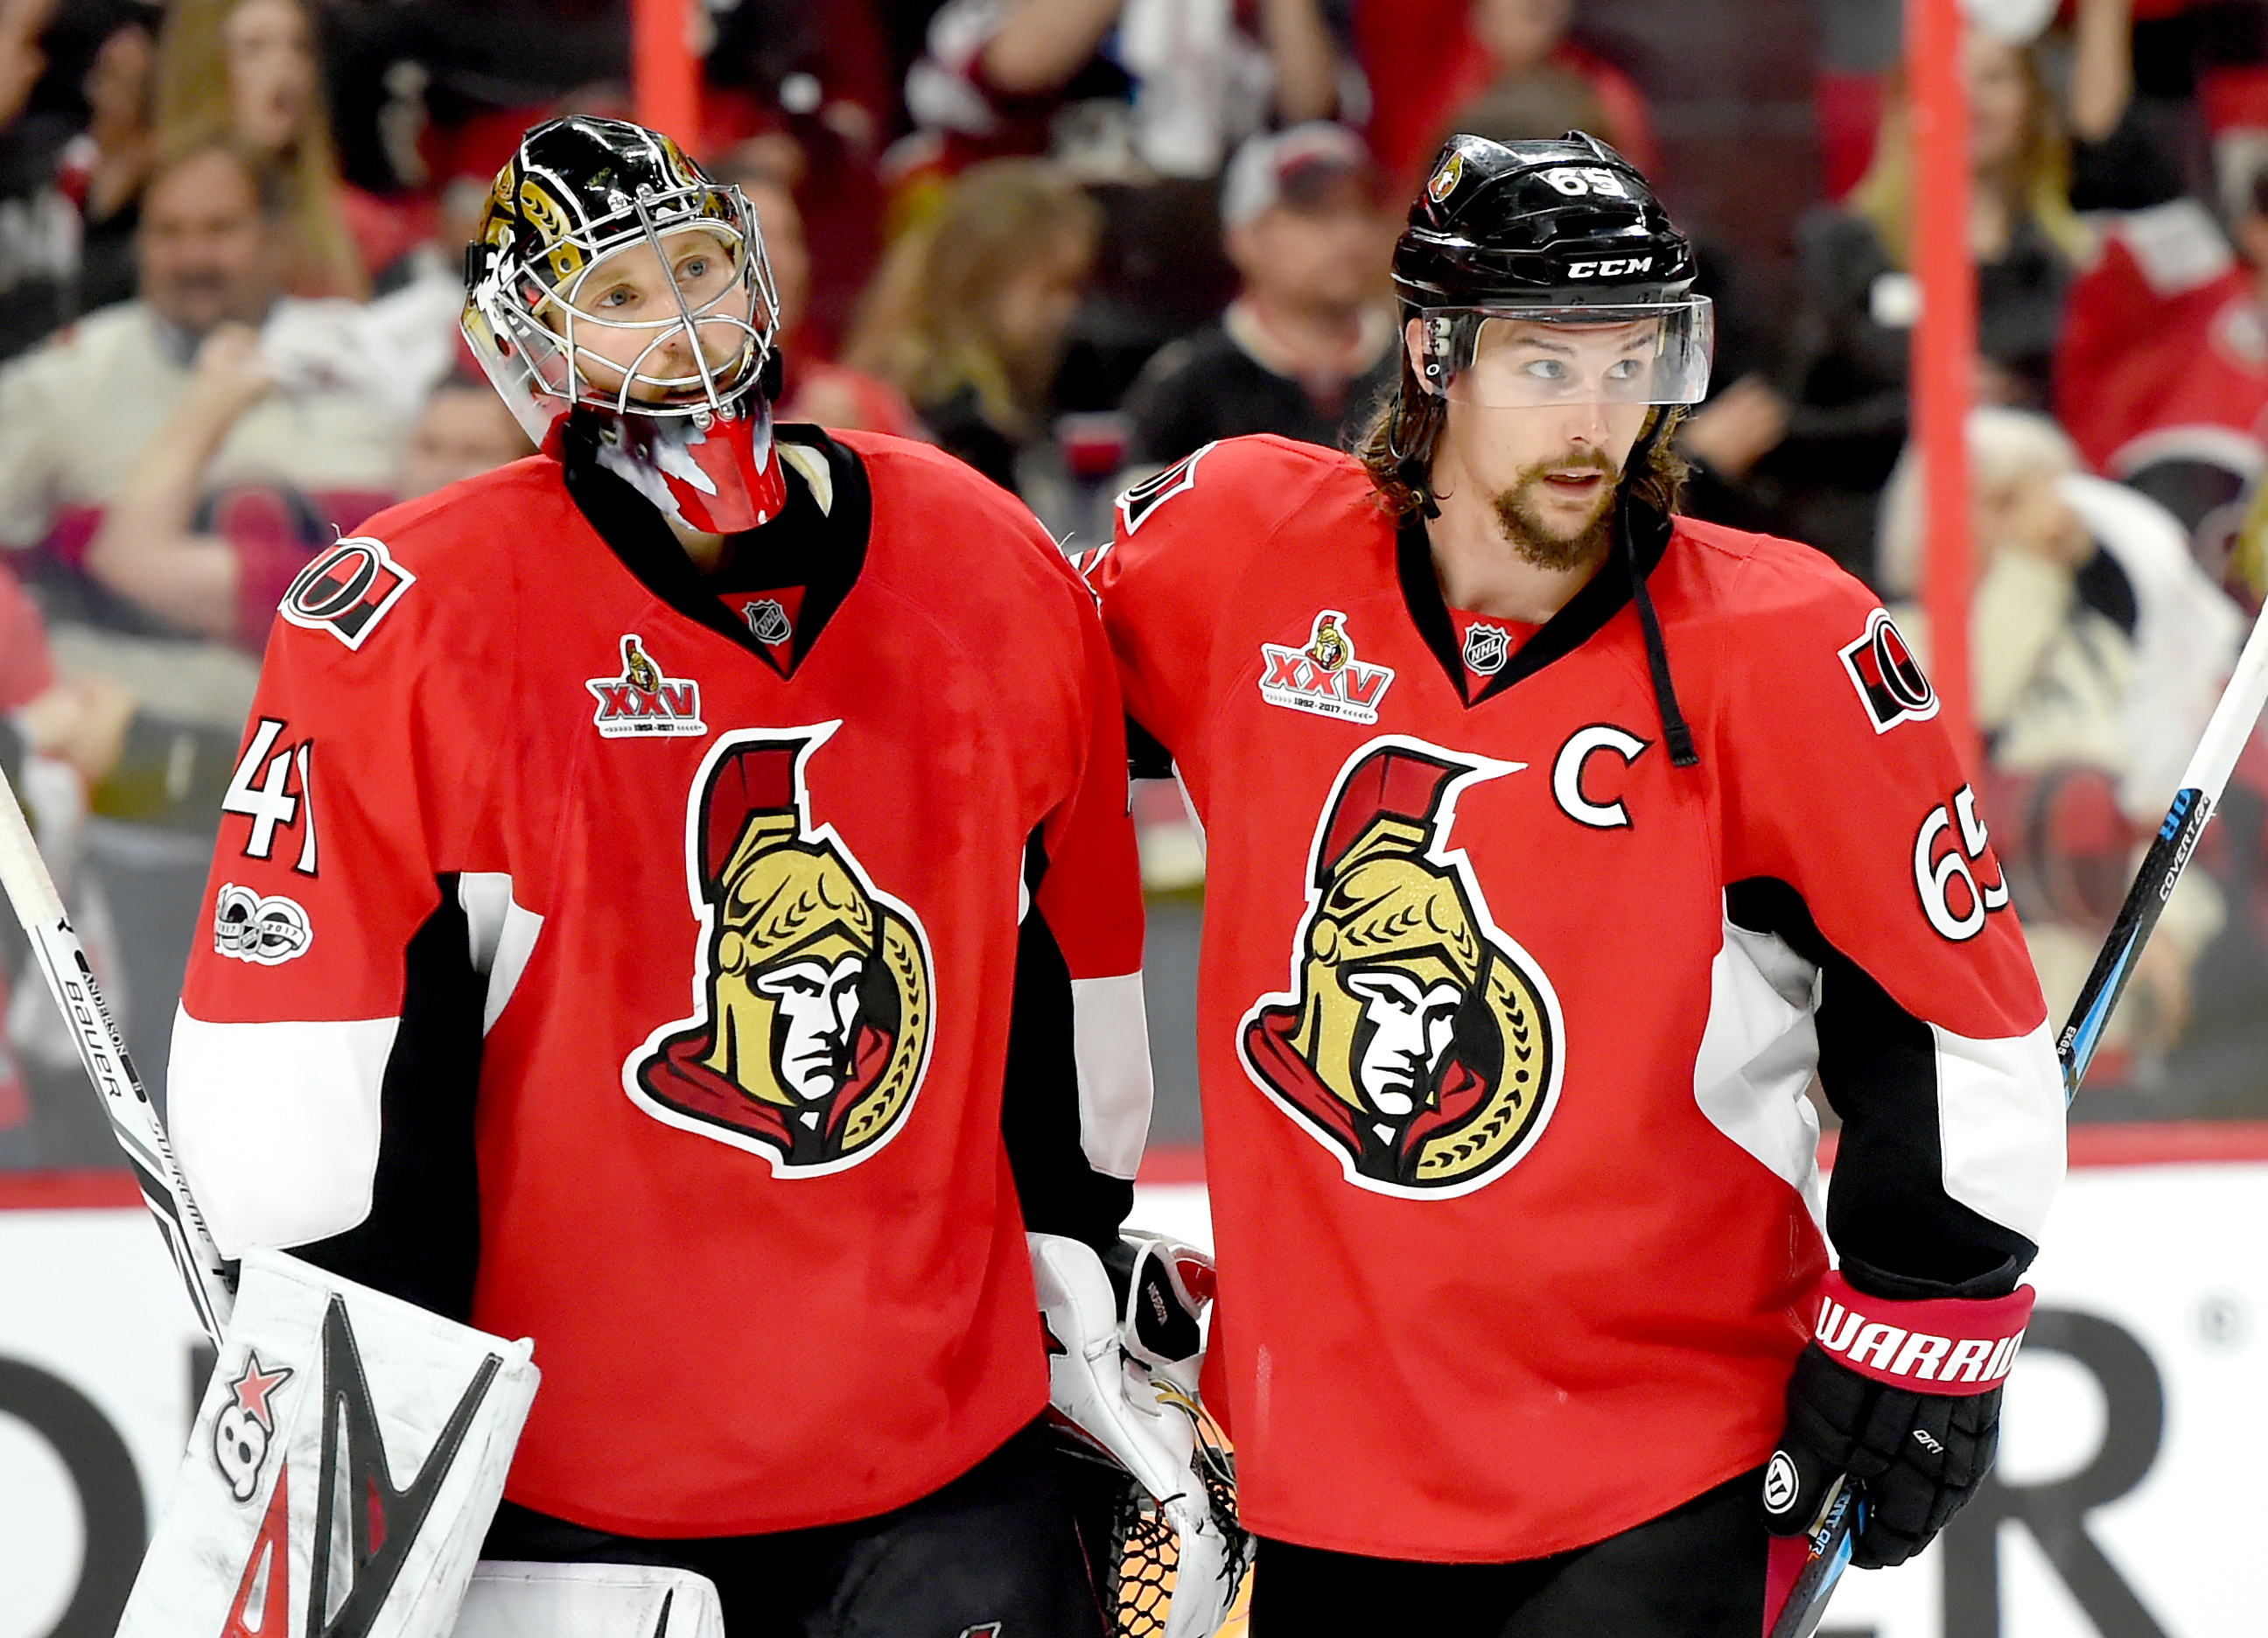 71a66f7183f Ottawa Senators defenceman Erik Karlsson (65) congratulates goalie Craig  Anderson as they celebrate a 2-1 win (Dan Hamilton-USA TODAY Sports)